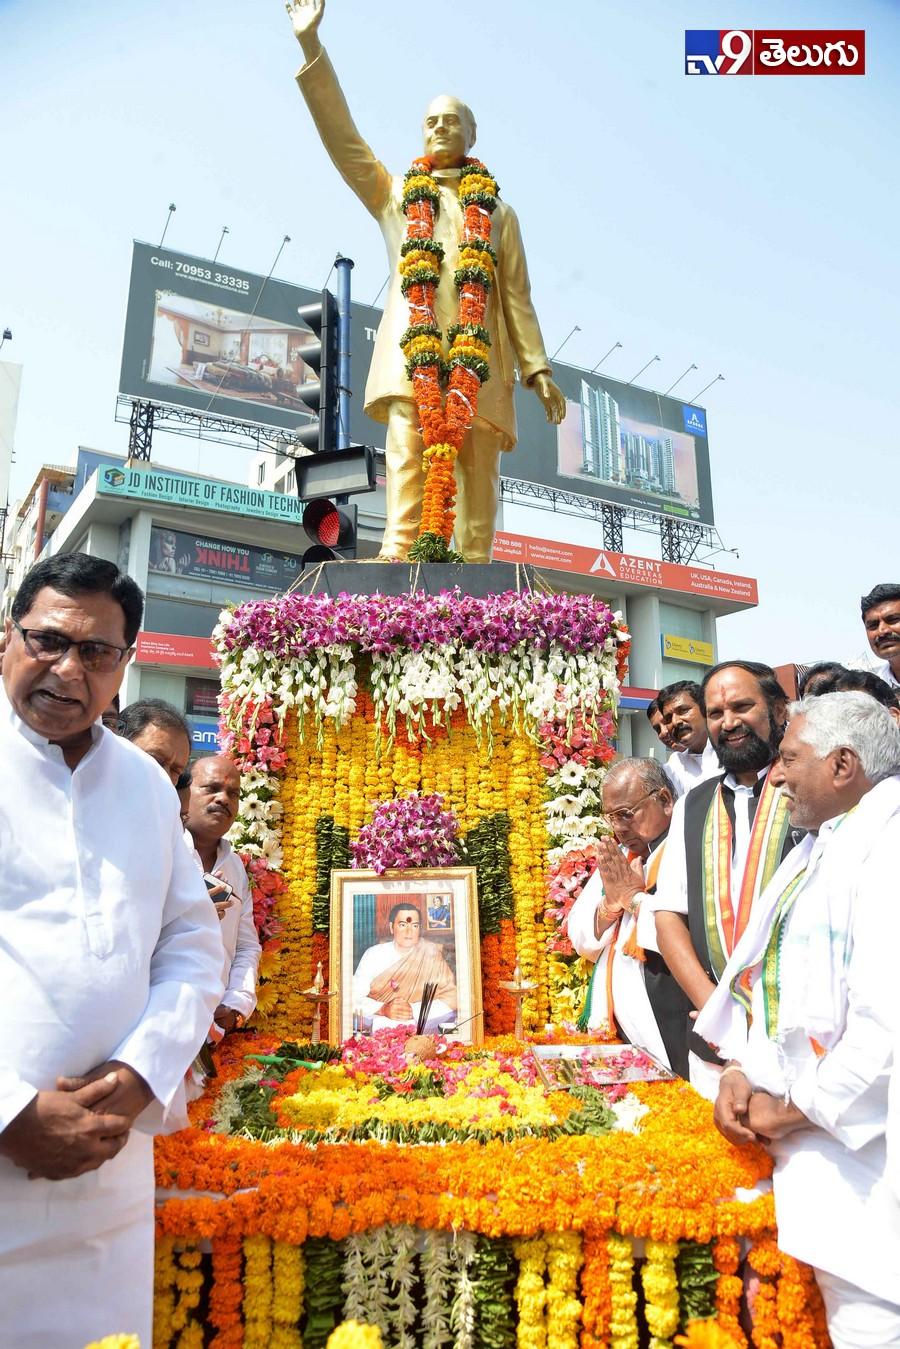 Rajiv Gandhi death anniversary at Hyderabad, మాజీ ప్రధాని రాజీవ్గాంధీ వర్థంతి సందర్భంగా హైదరాబాద్ లో  నివాళులర్పించిన ప్రముఖులు